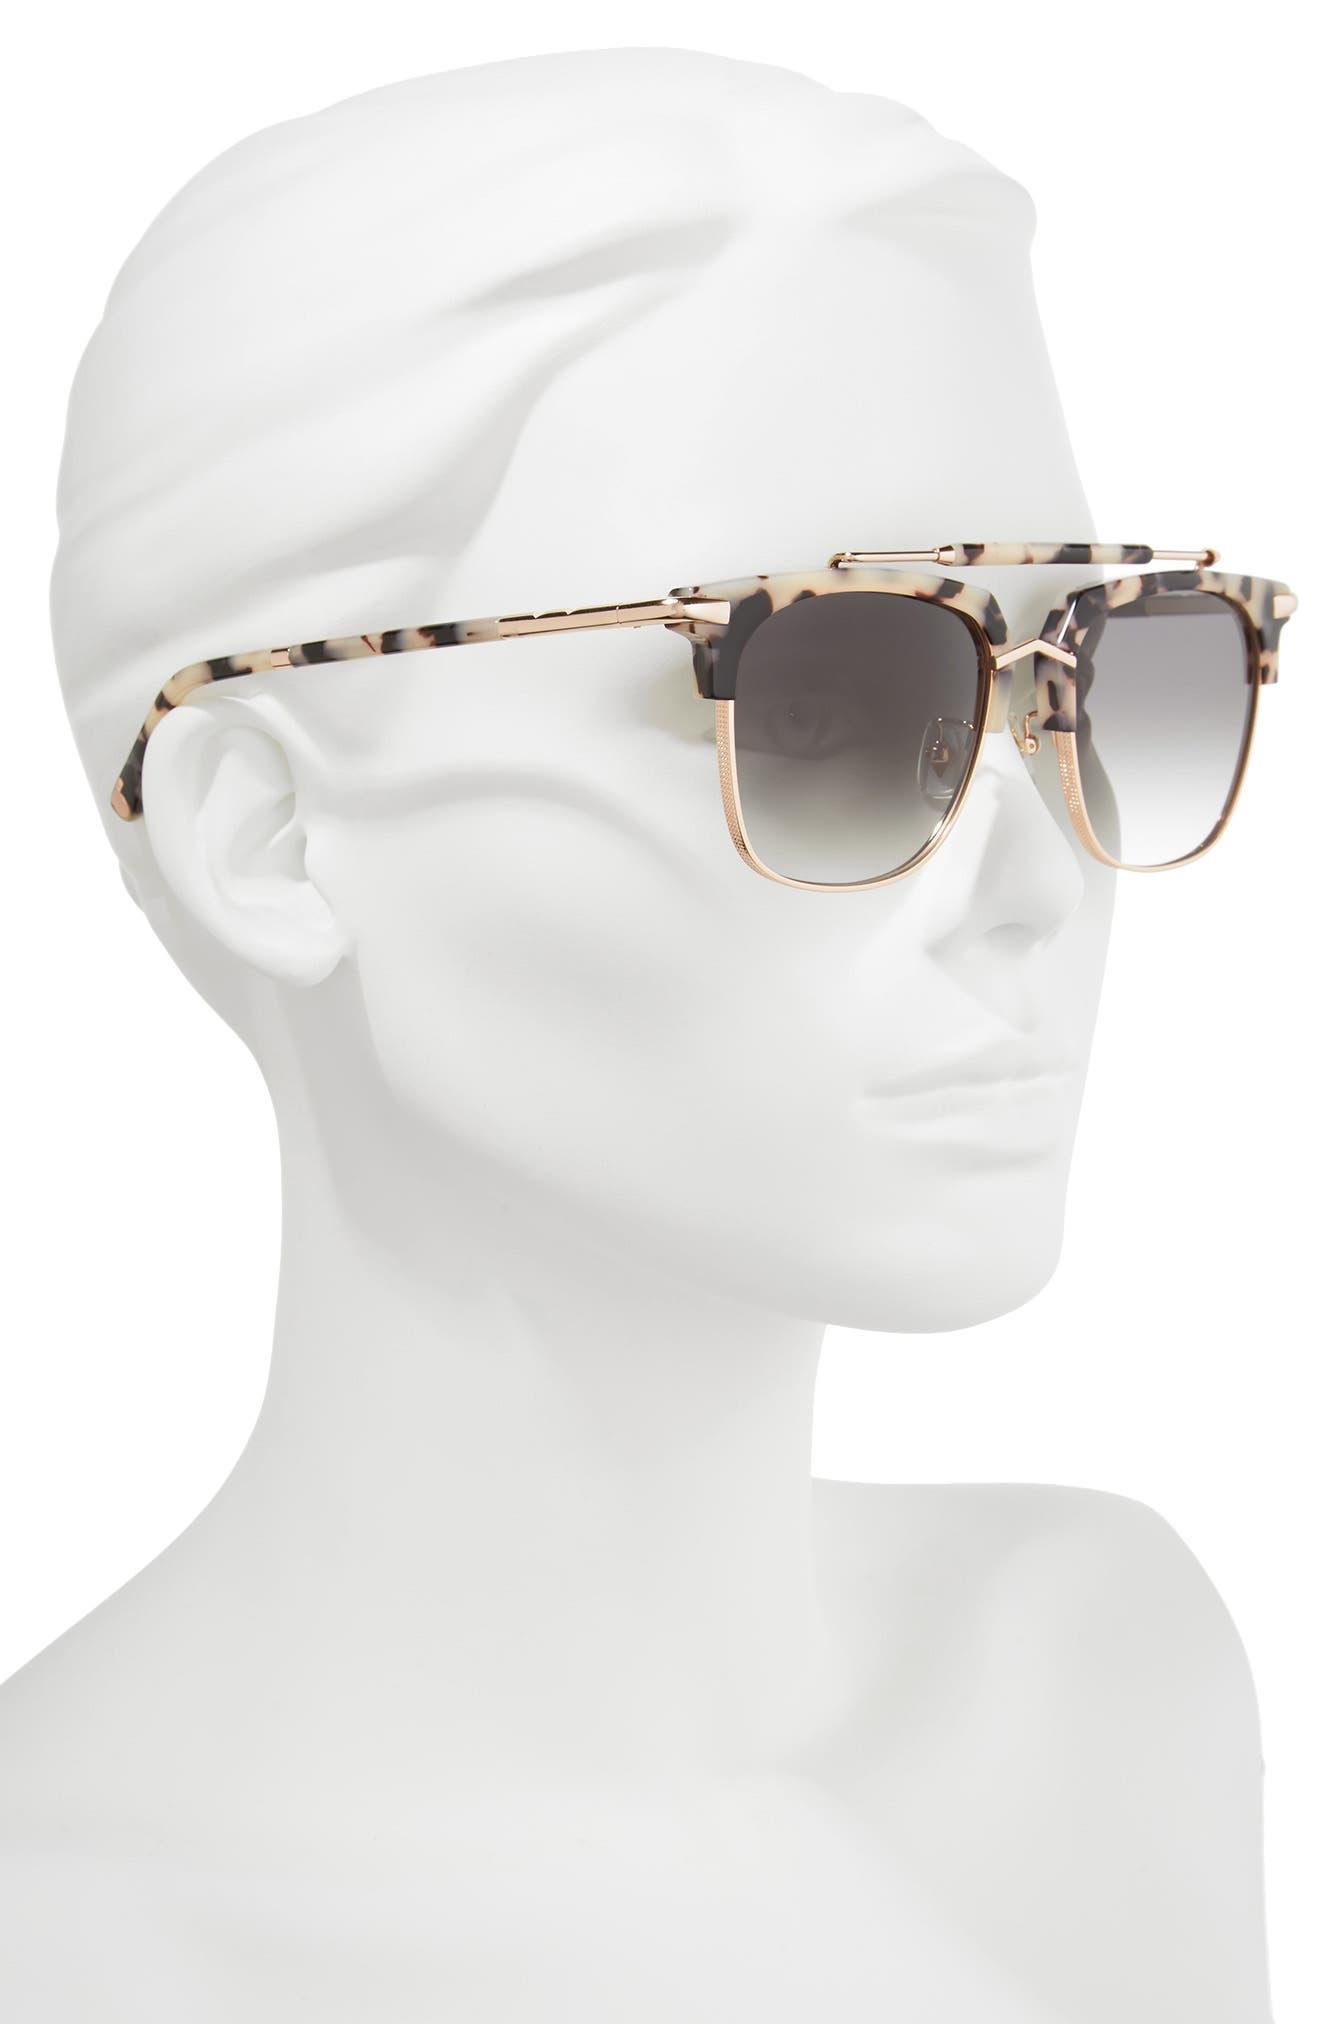 Cocktails & Dreams 53mm Sunglasses,                             Alternate thumbnail 2, color,                             COOKIES/ CREAM/ ROSE GOLD GREY